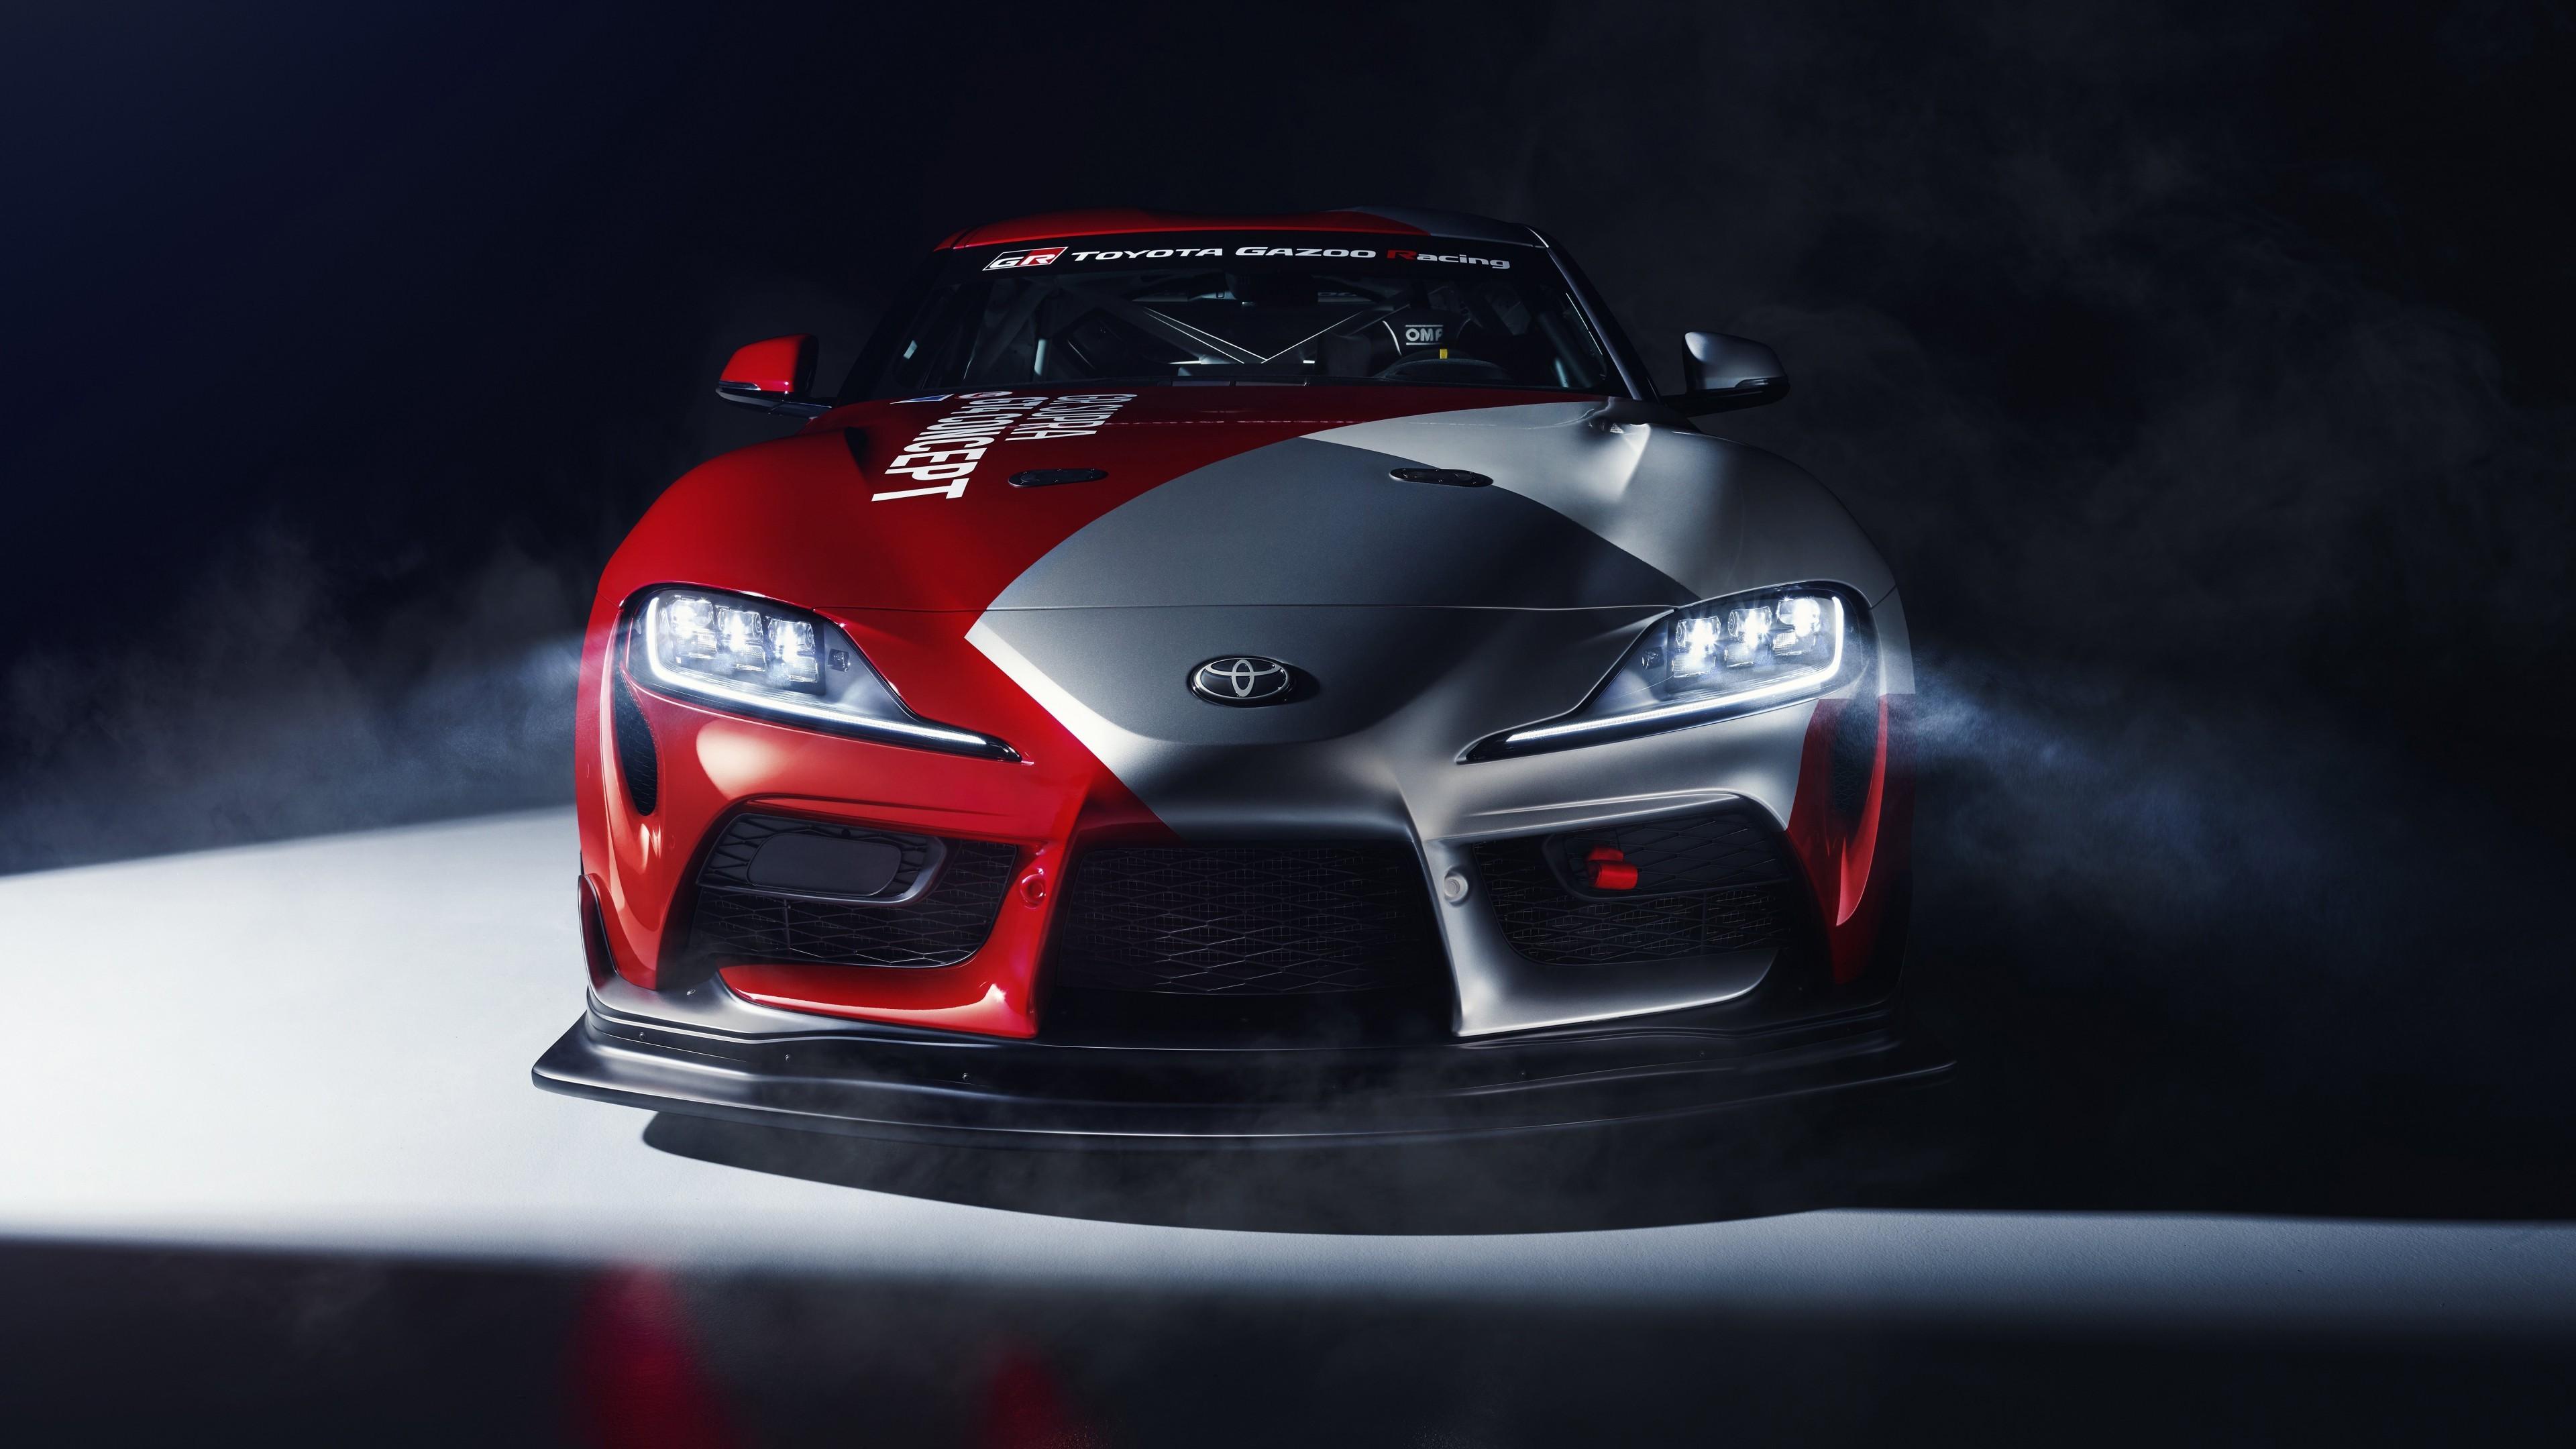 Download 3840x2160 Toyota Gr Supra Gt4 Racing Cars Concept 3840x2160